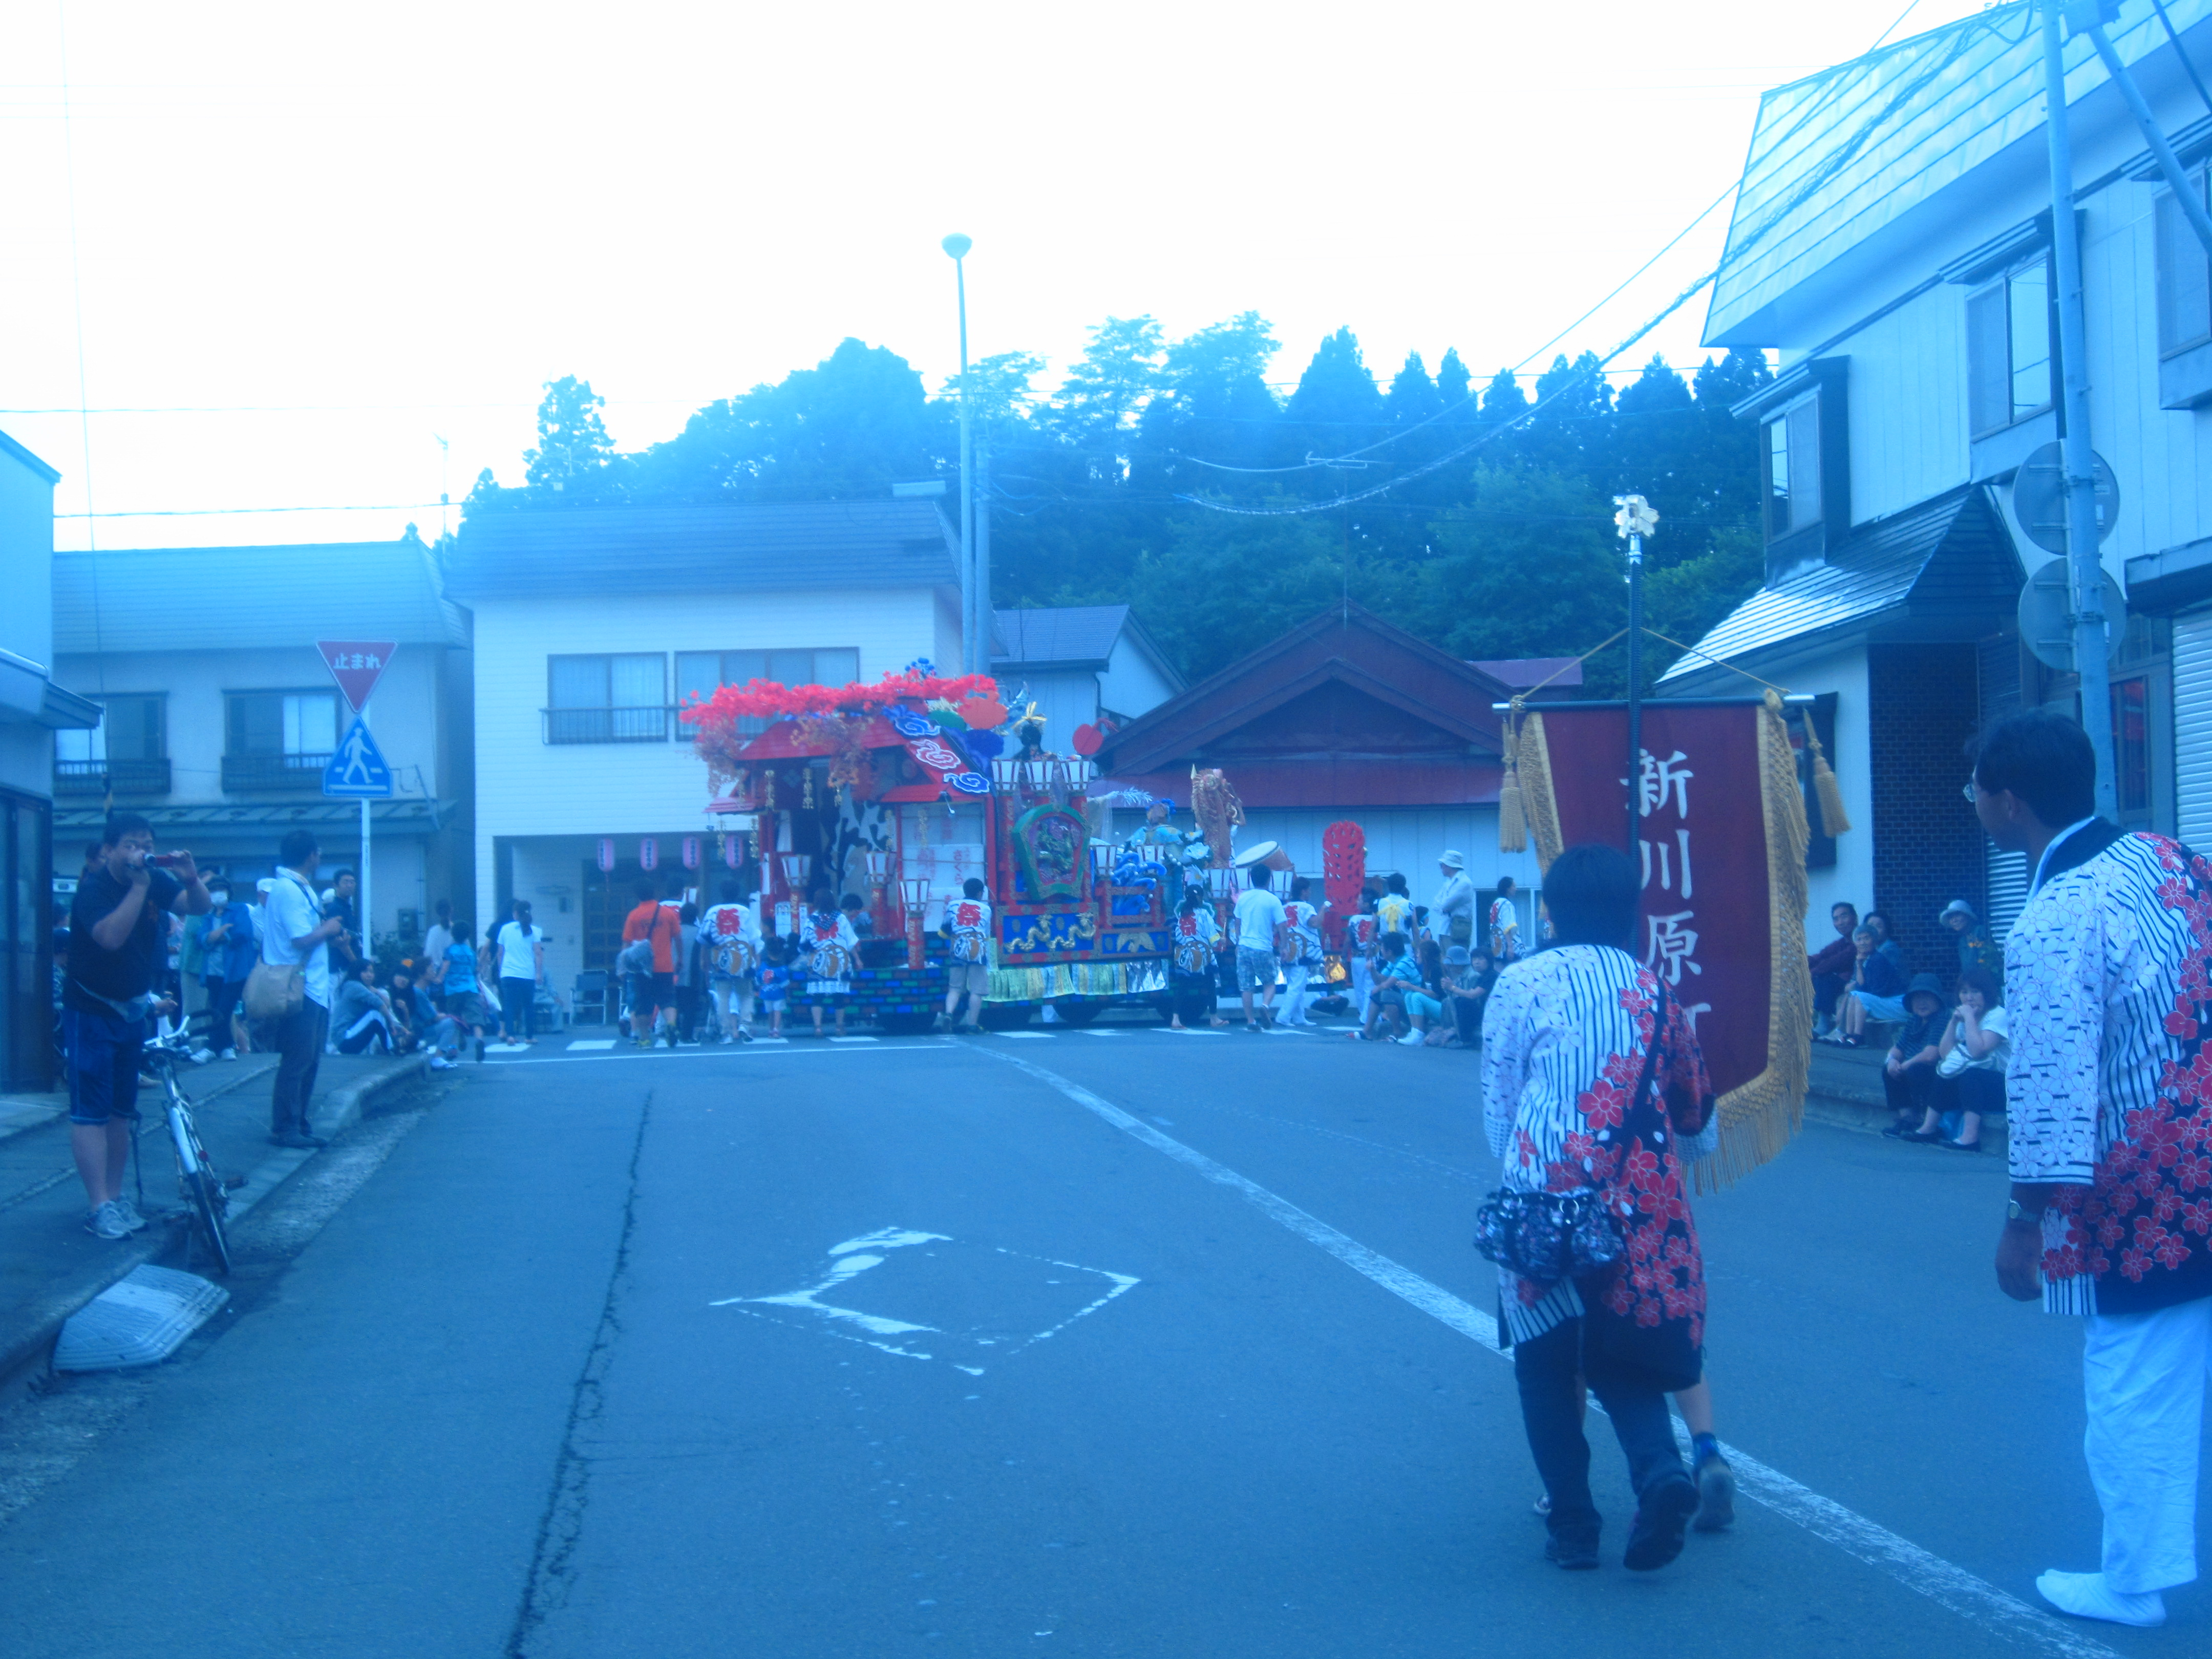 IMG 4261 - 麻布十番納涼祭り25,26日(七戸町出店)